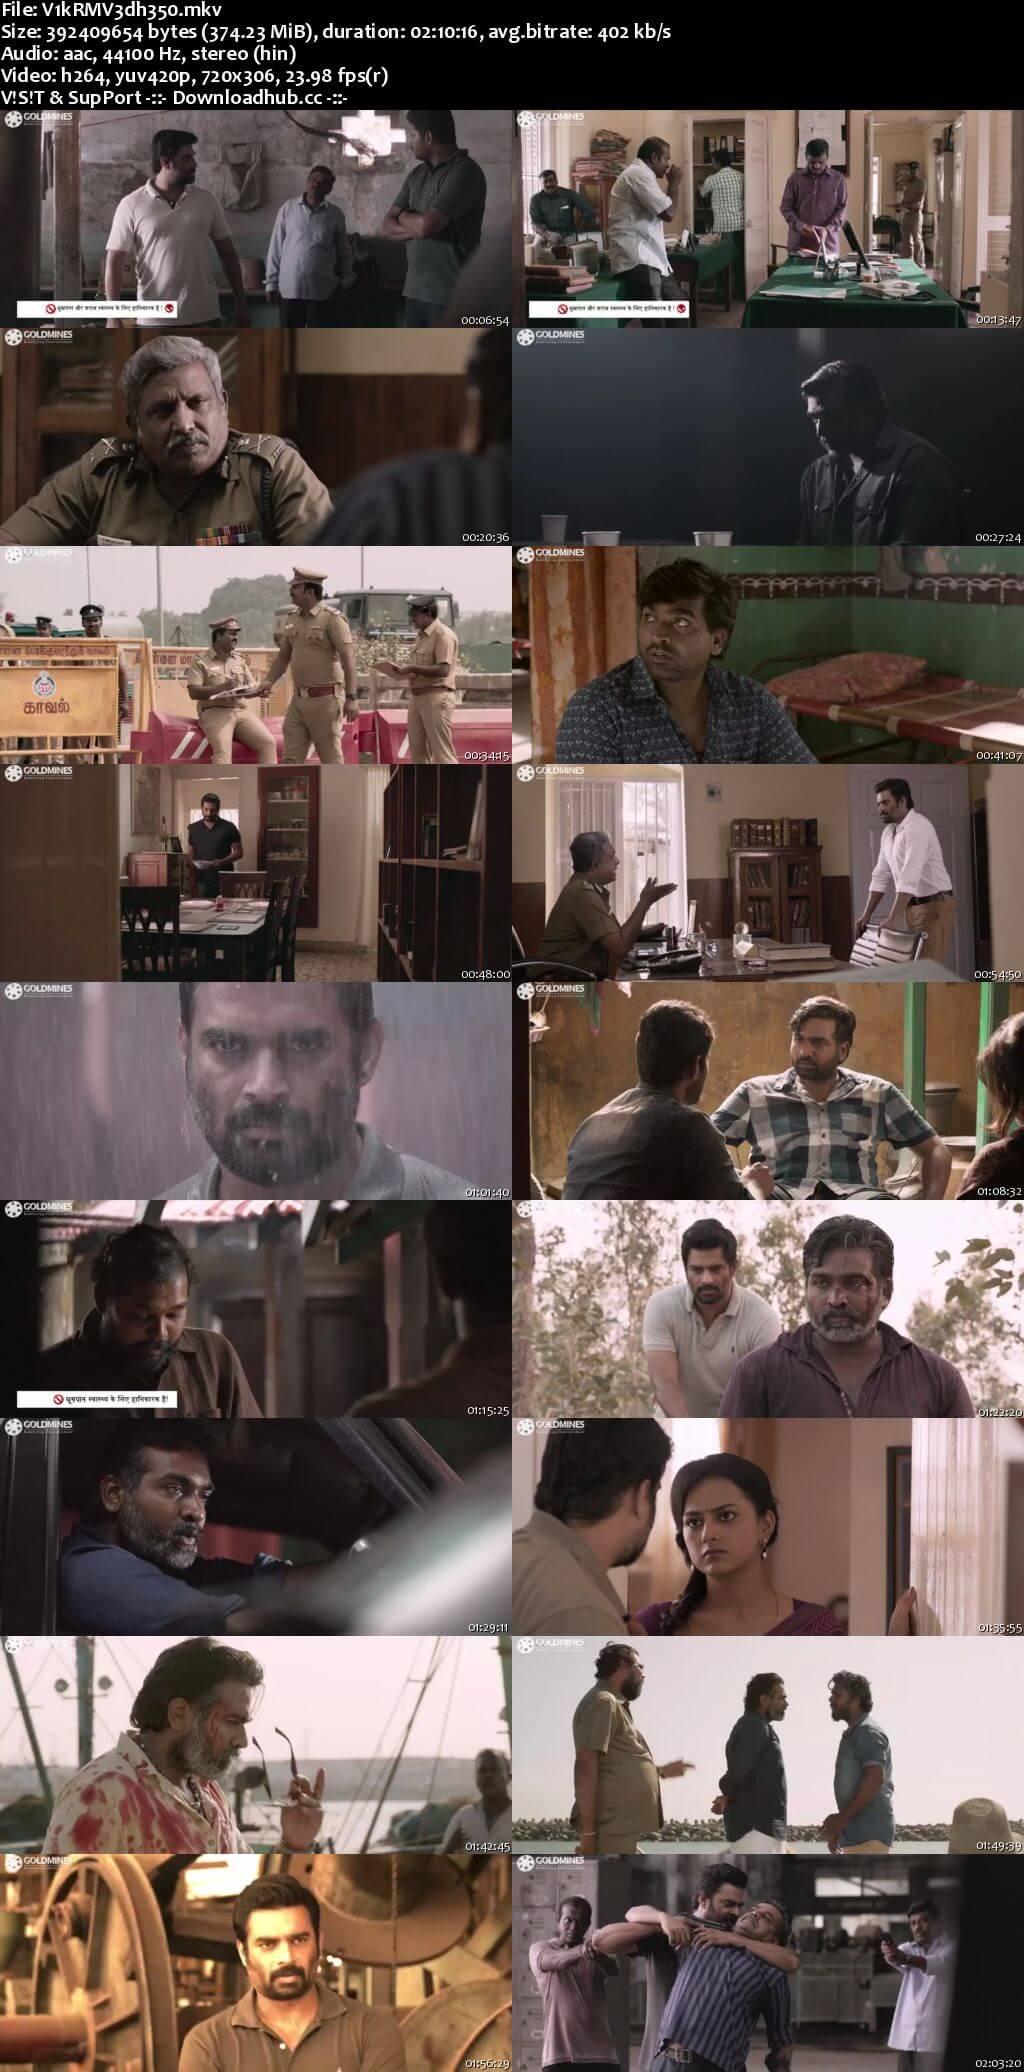 Vikram Vedha 2018 Hindi Dubbed 480p HDRip